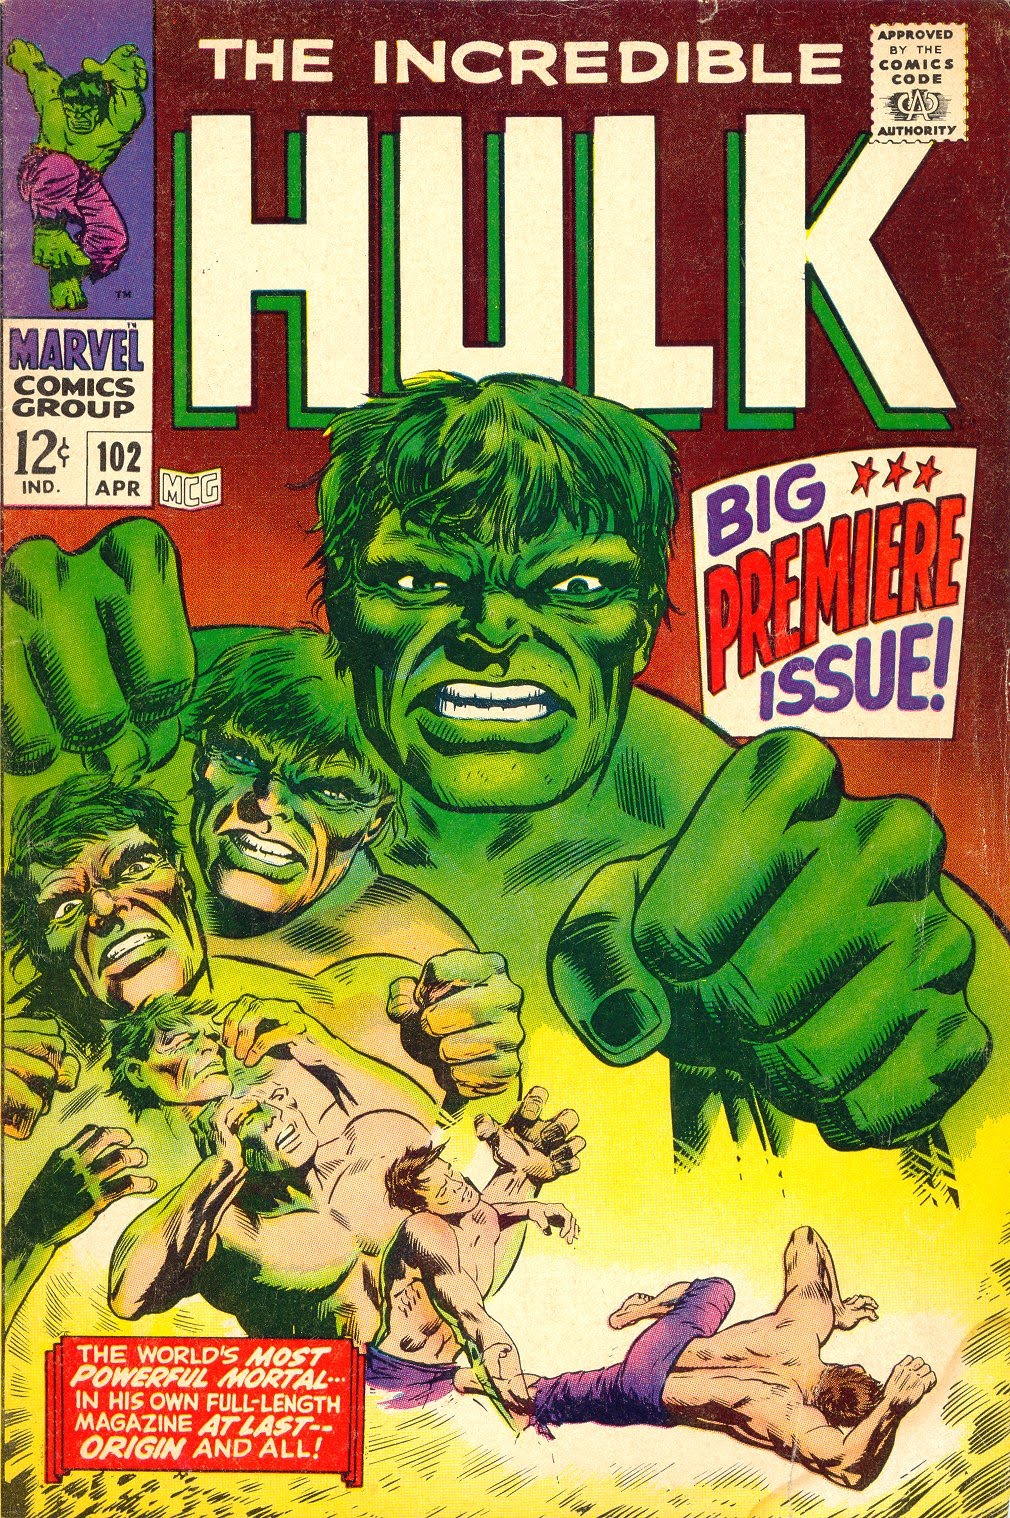 The incredible hulk online